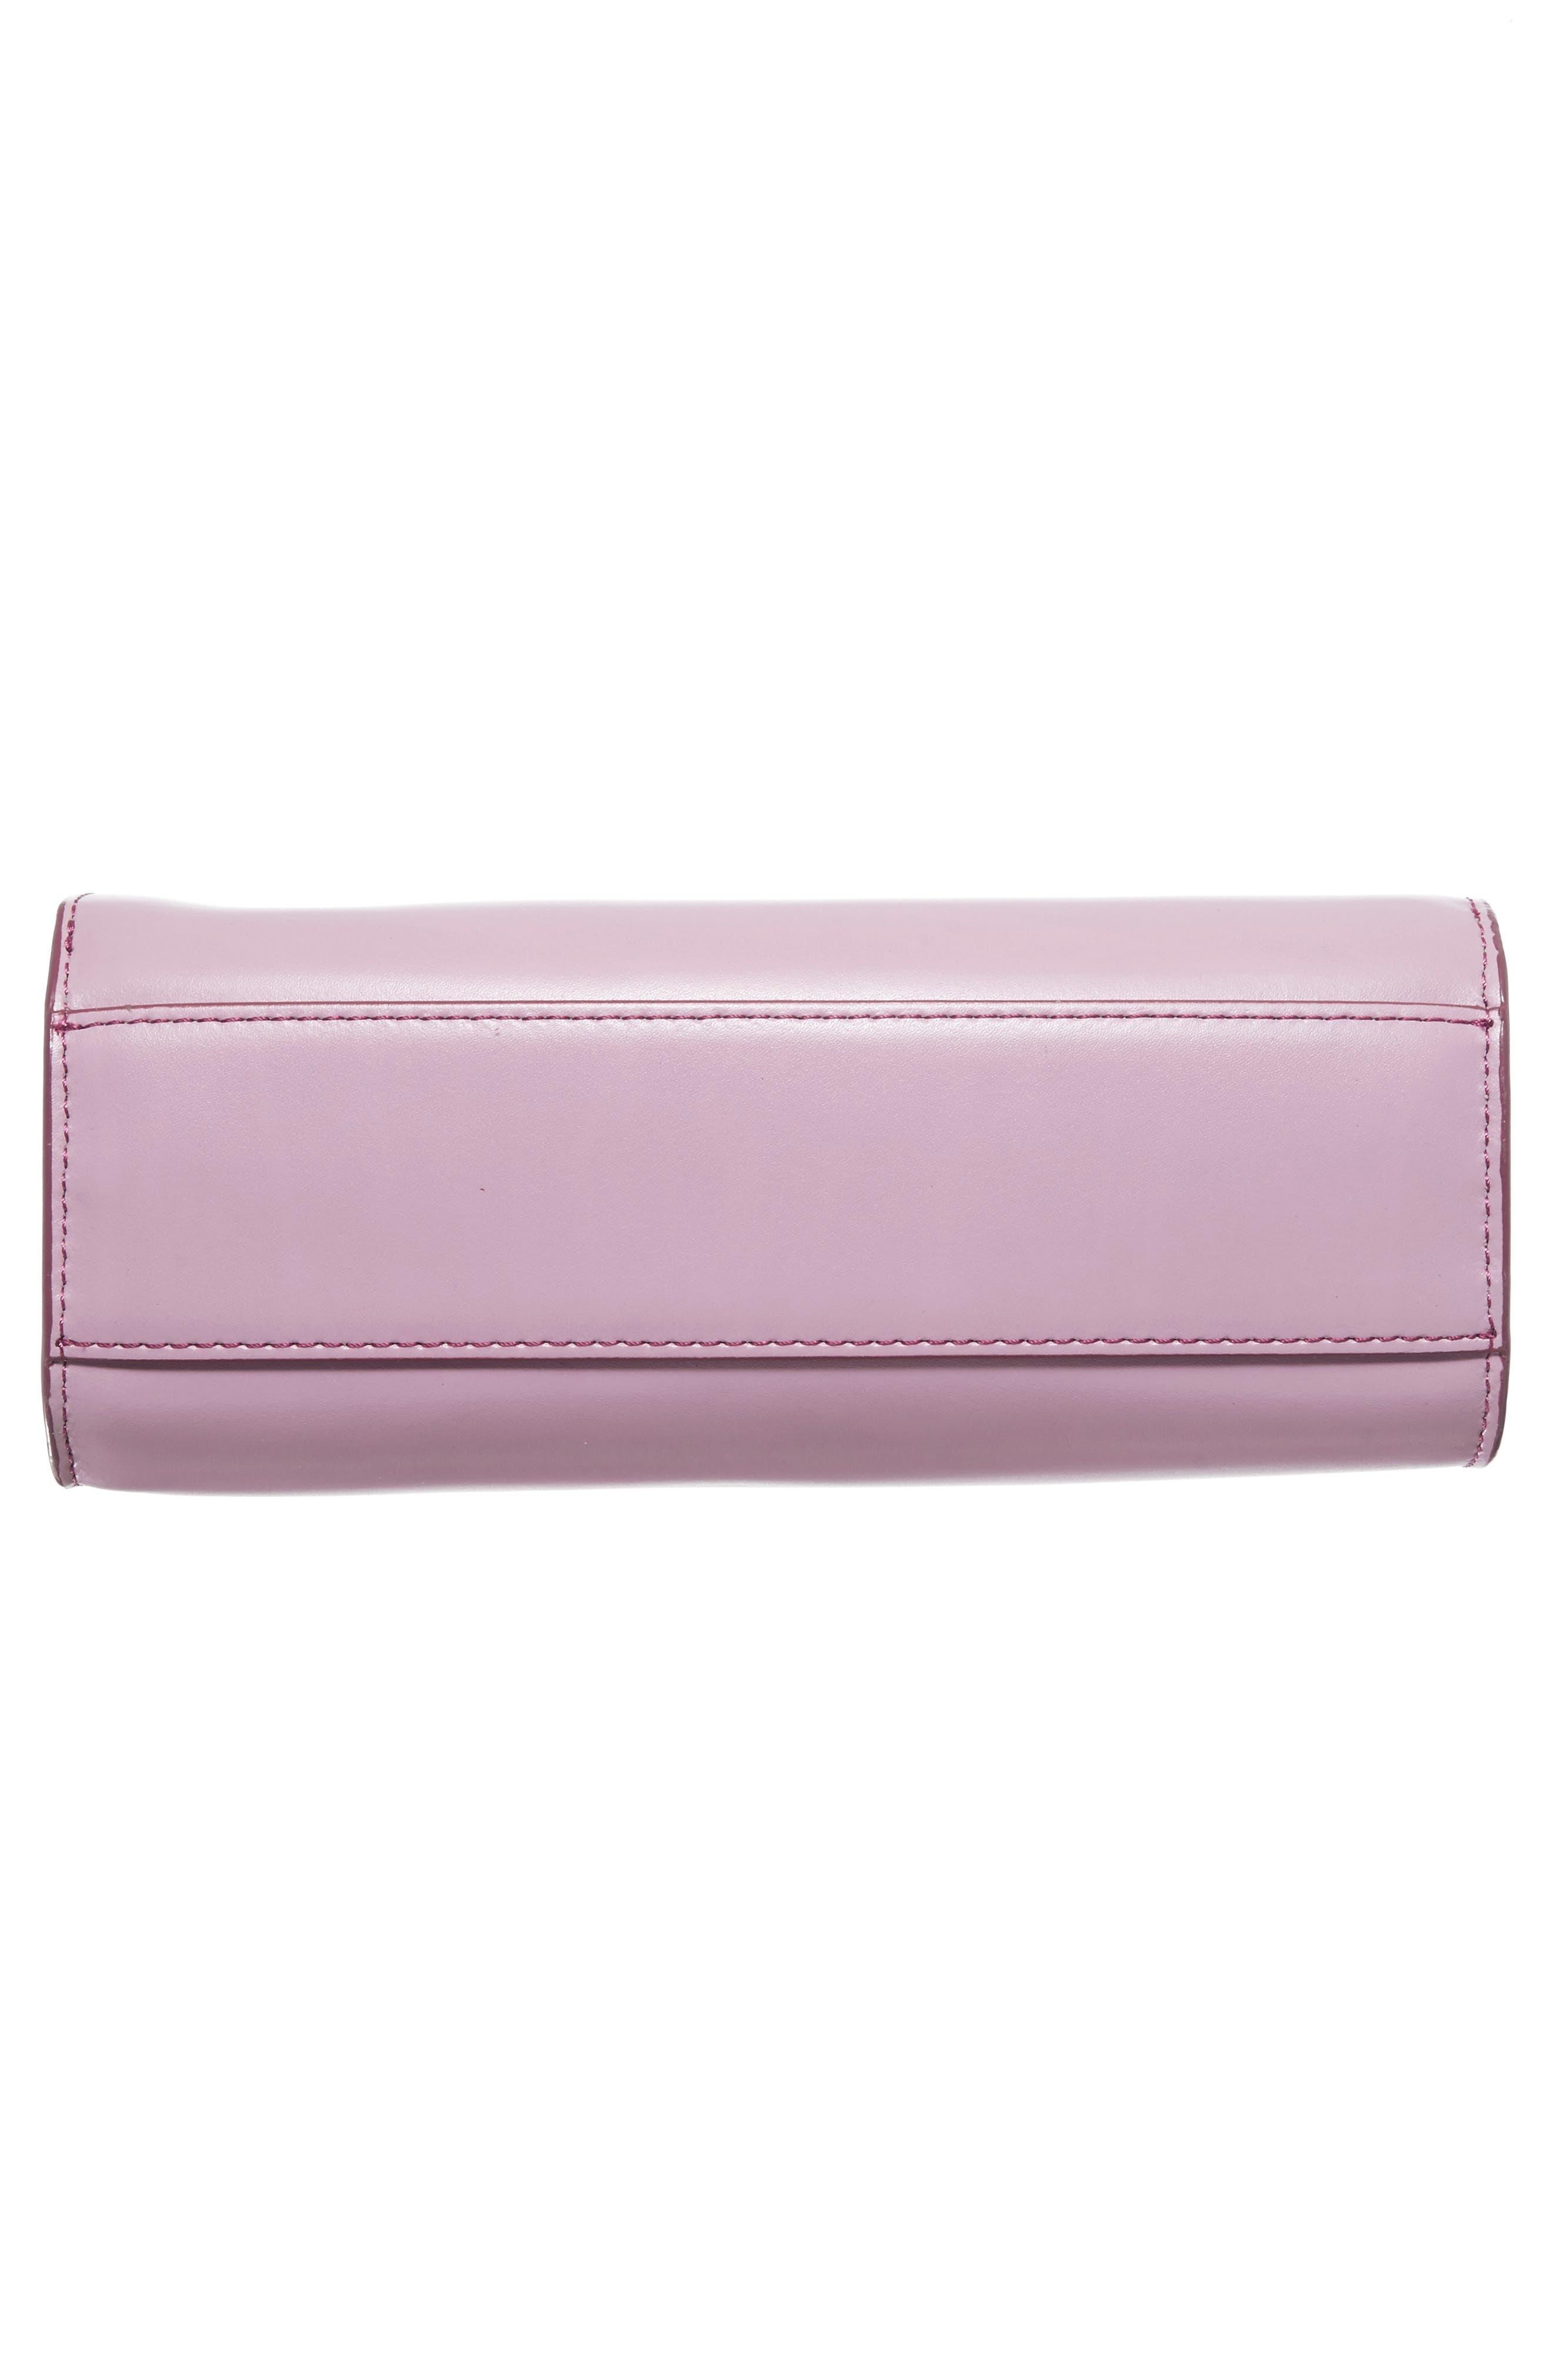 Lodis'Audrey Collection -Vicky' ConvertibleCrossbody Bag,                             Alternate thumbnail 37, color,